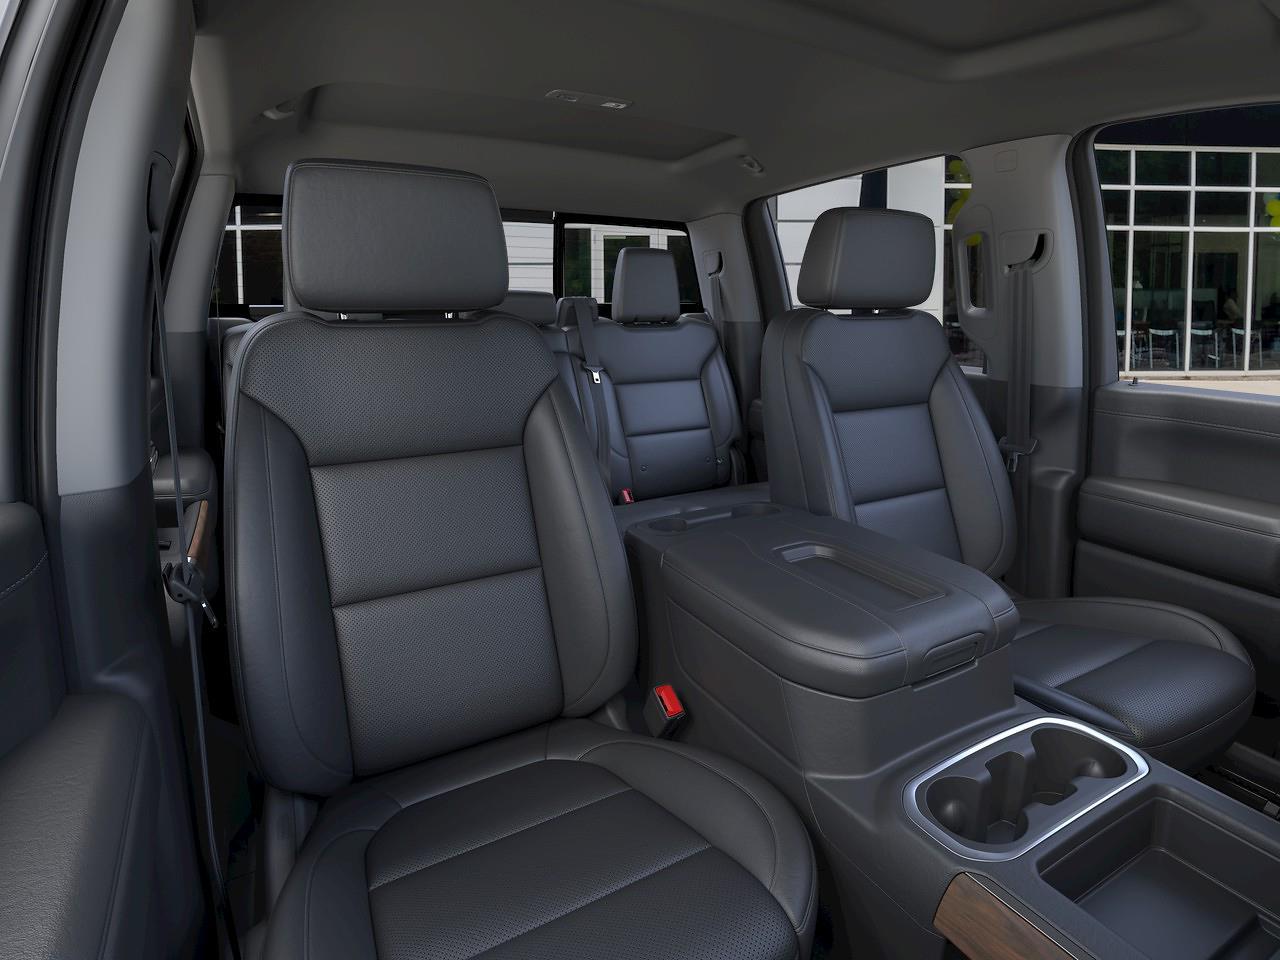 2021 GMC Sierra 2500 Crew Cab 4x4, Pickup #ST21619 - photo 33